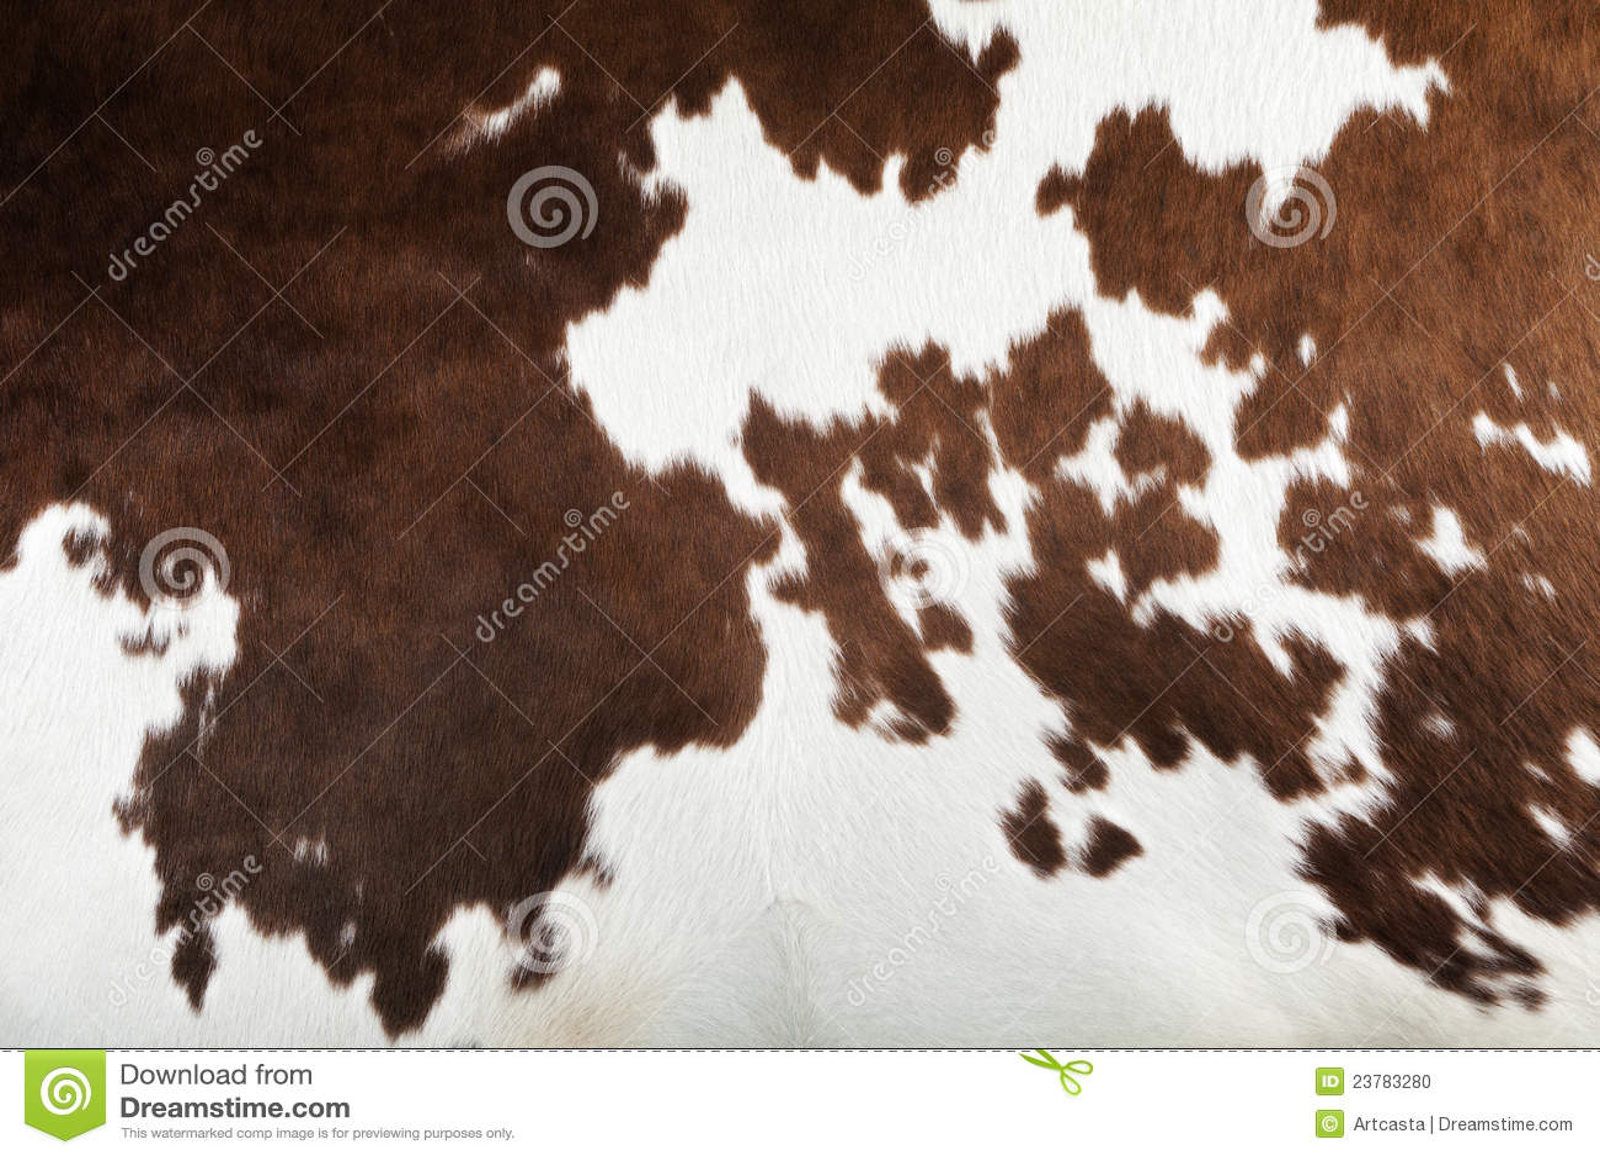 animal print wallpaper border